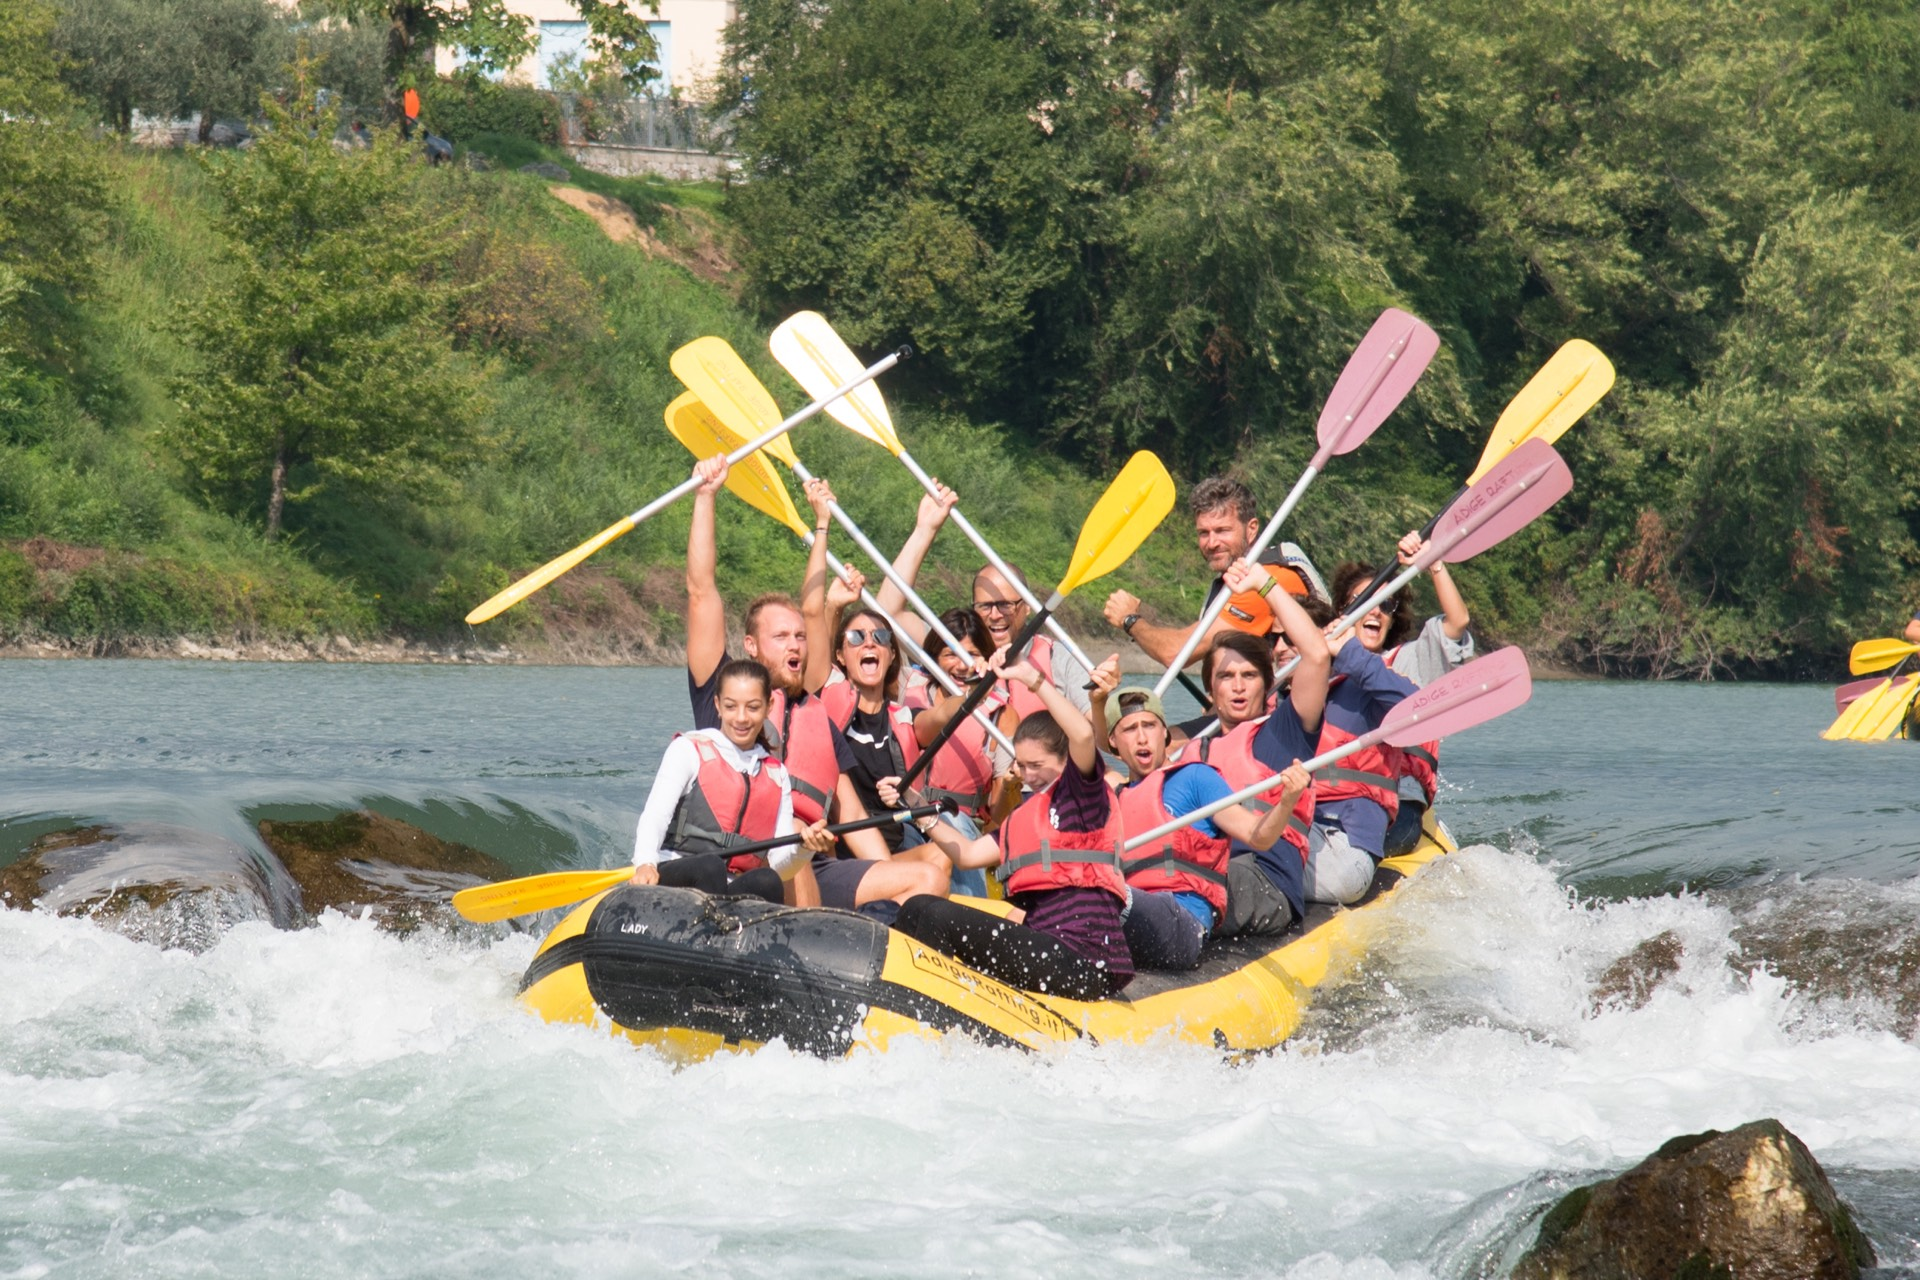 visitvaldadige tour sport cultura tra verona e adige visitvaldadigewine 17